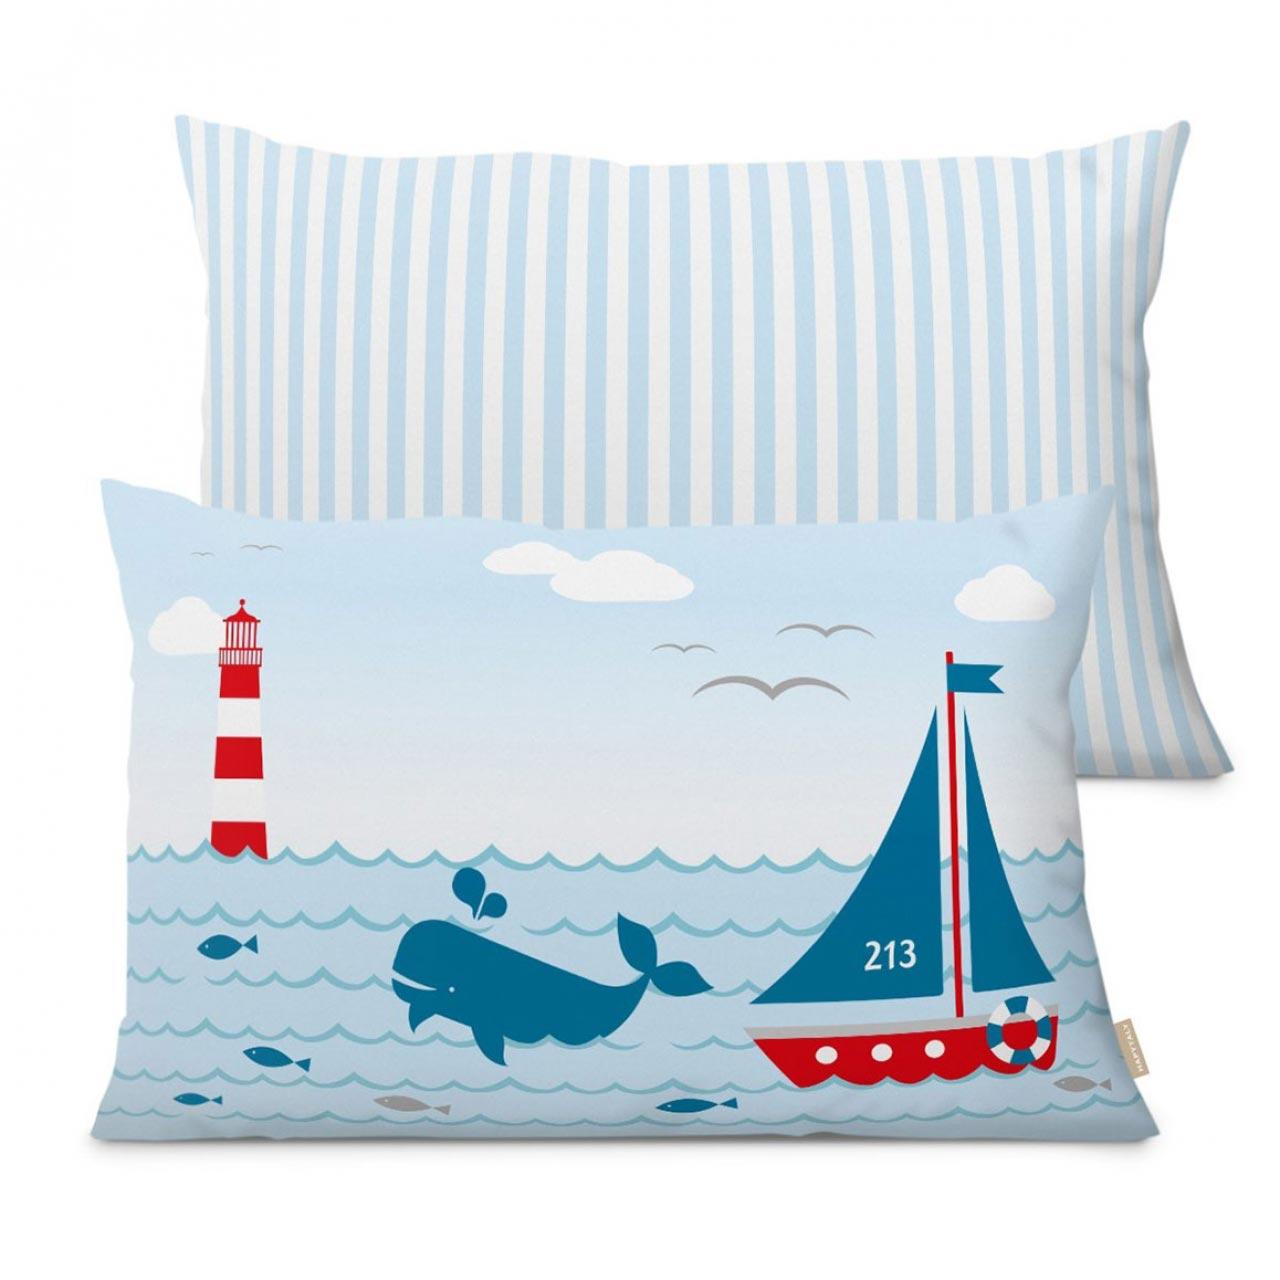 Kissen, maritimes Design mit Leuchtturm, Sailing Red 60 x40 cm